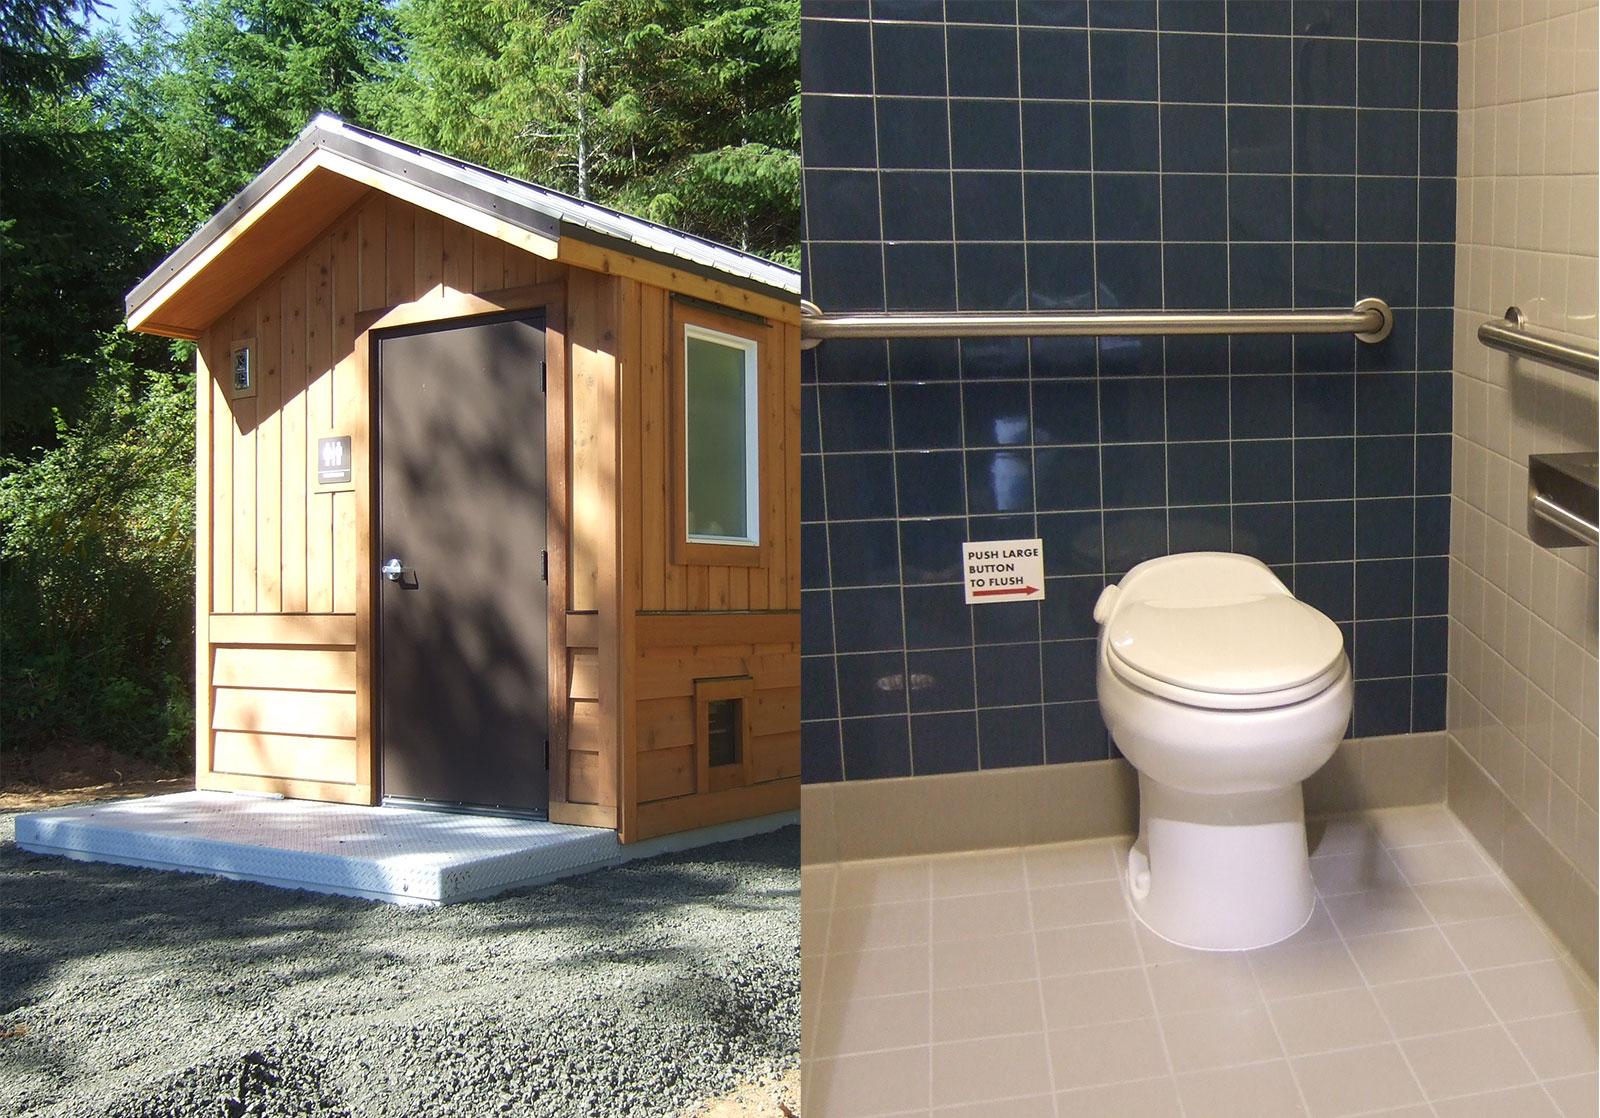 Flush Experience comparison